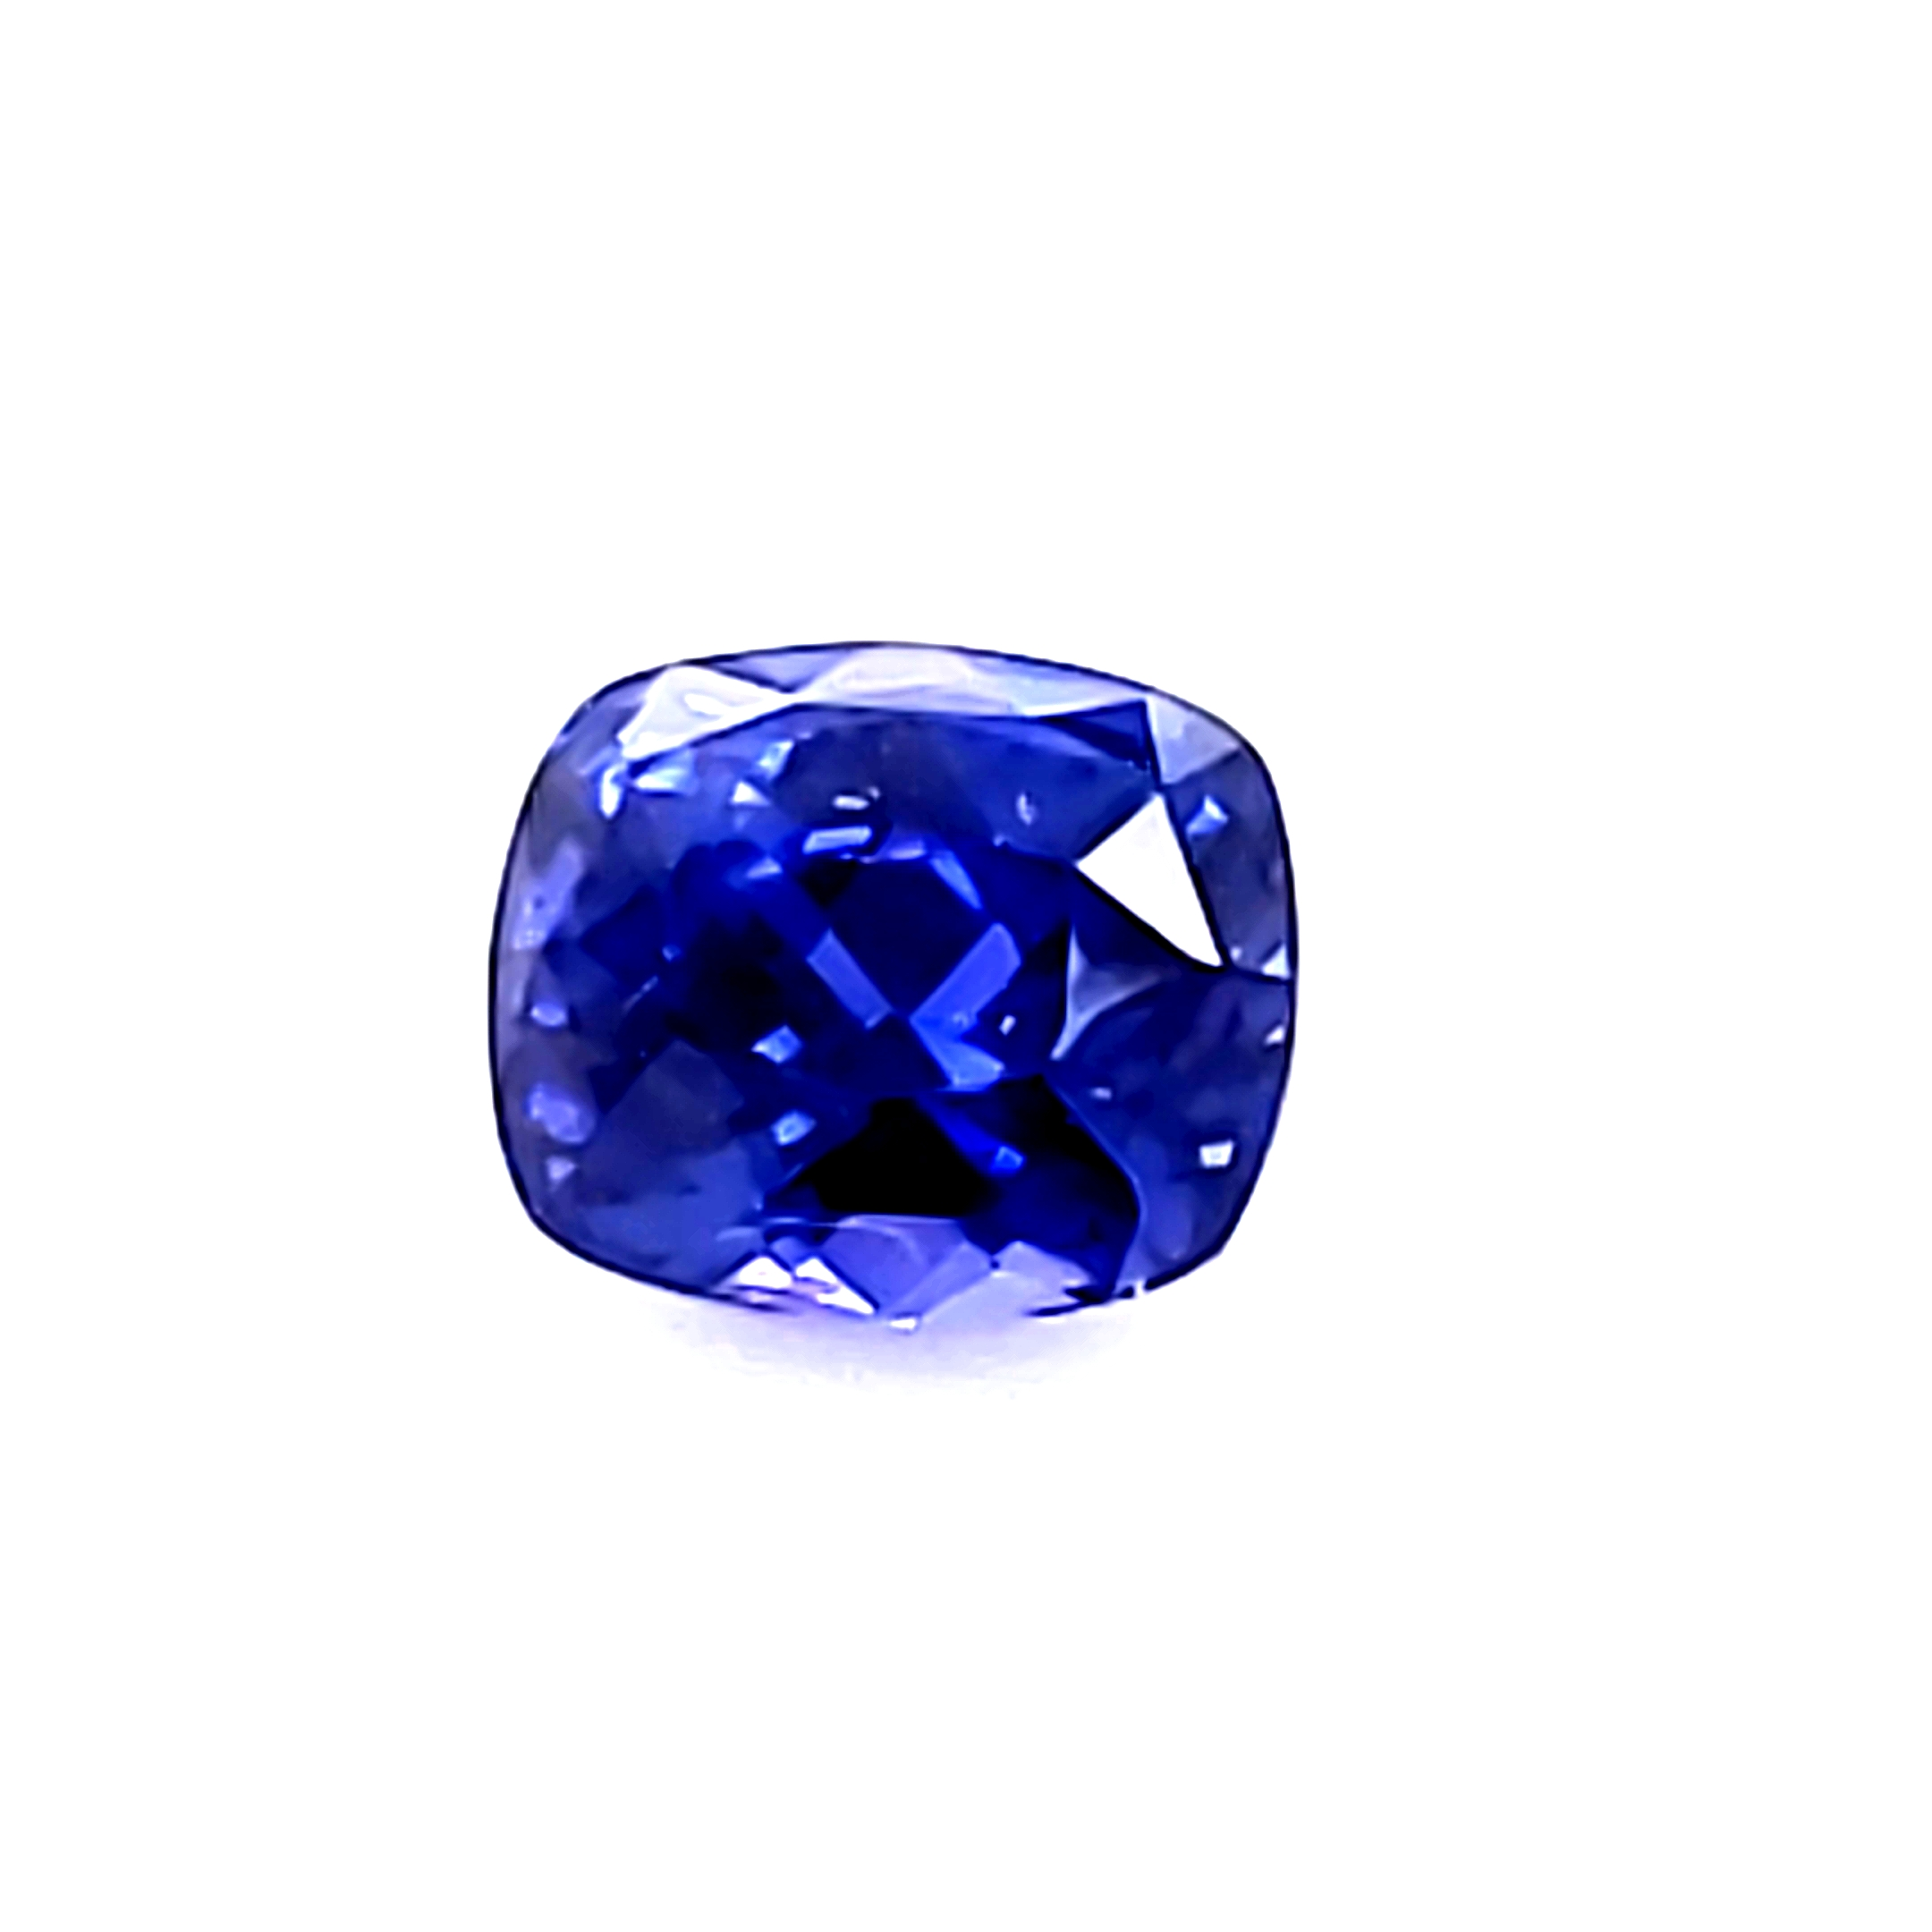 1.14 ct. Color Change Sapphire